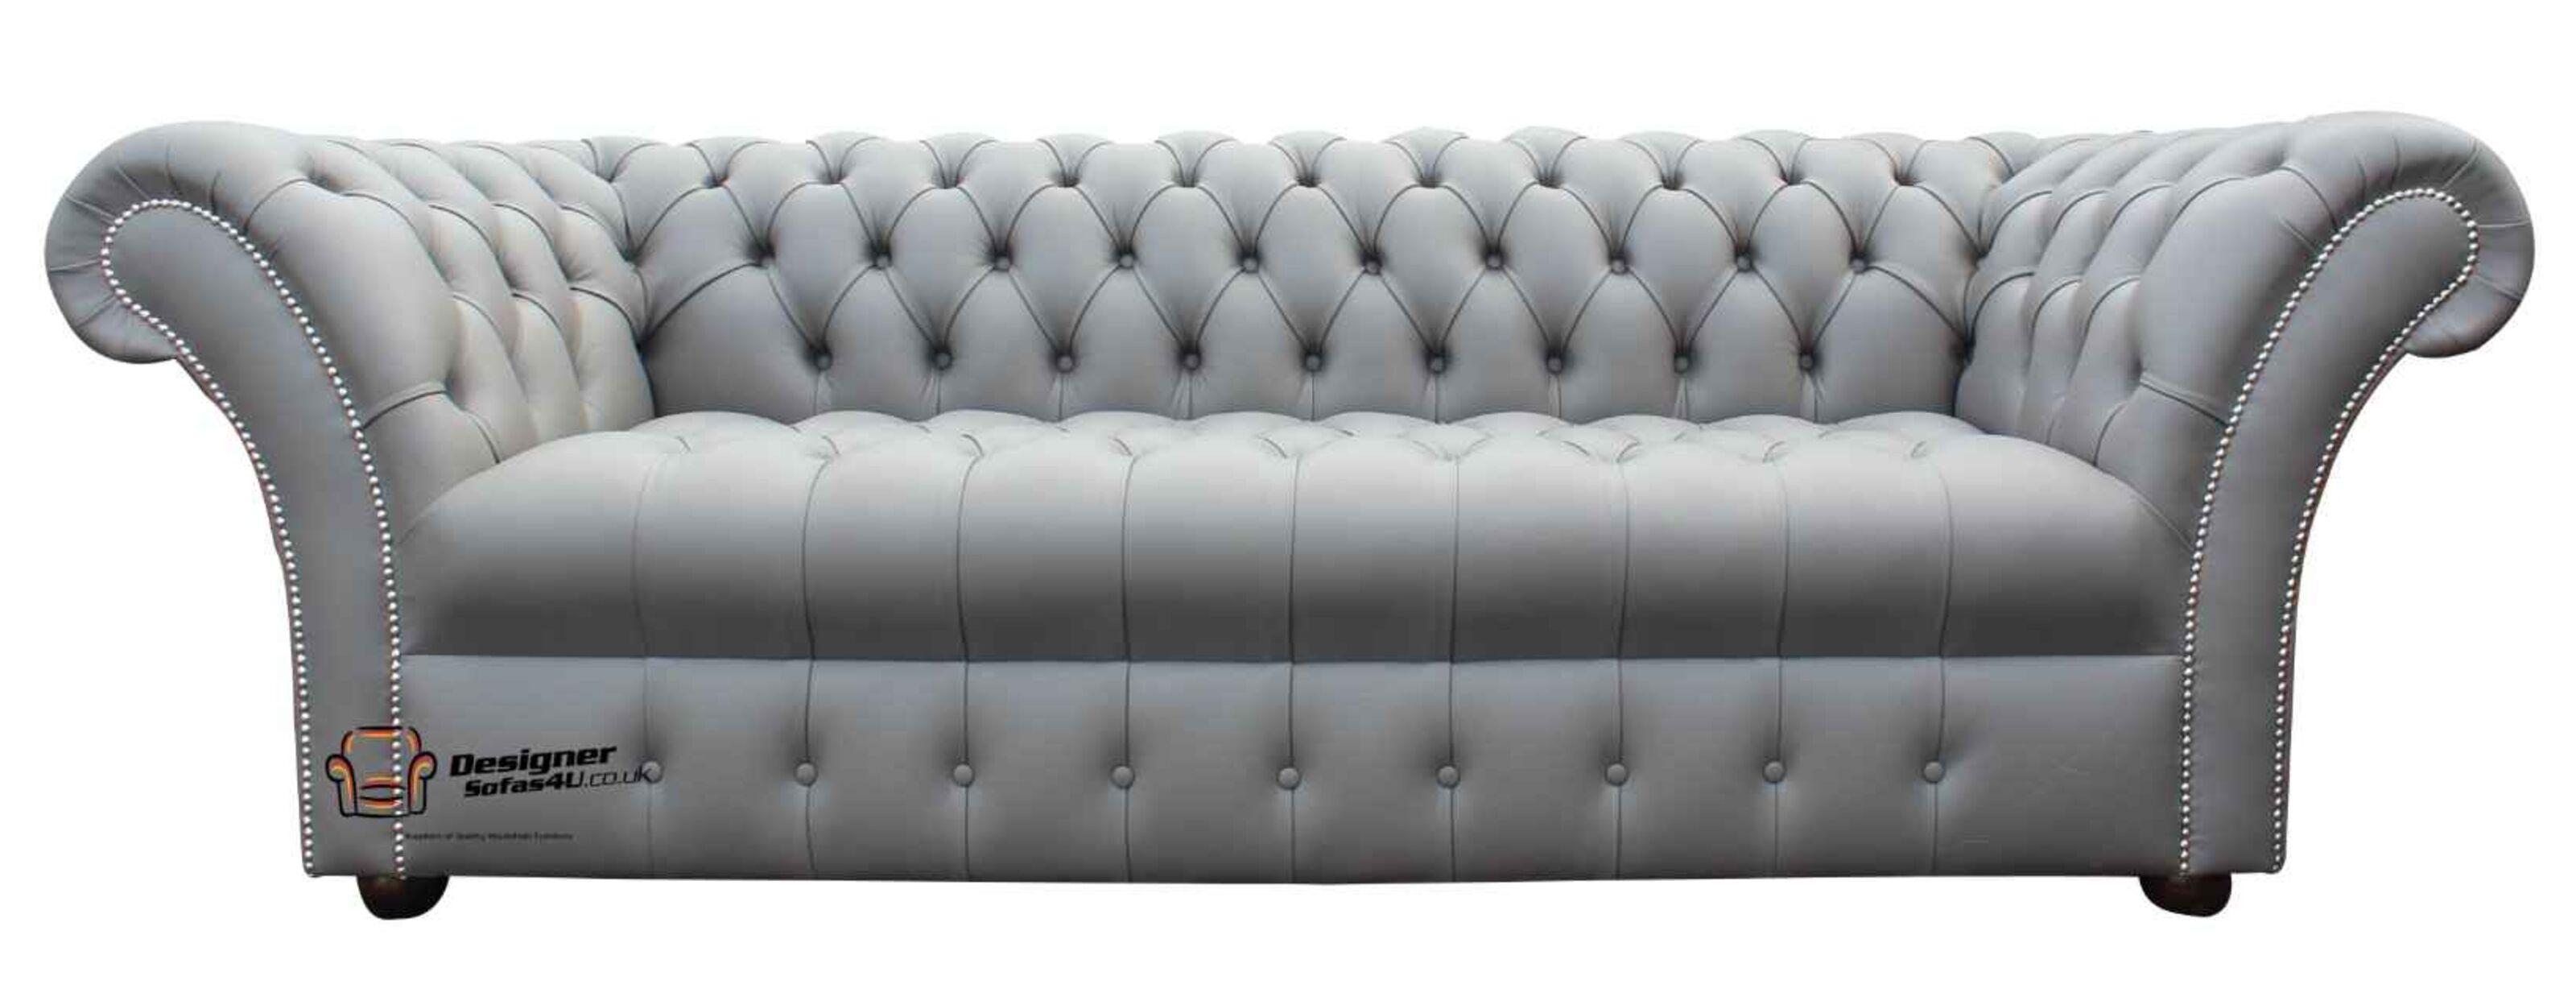 Chesterfield Balmoral 3 Seater Settee sofa | DesignerSofas4U